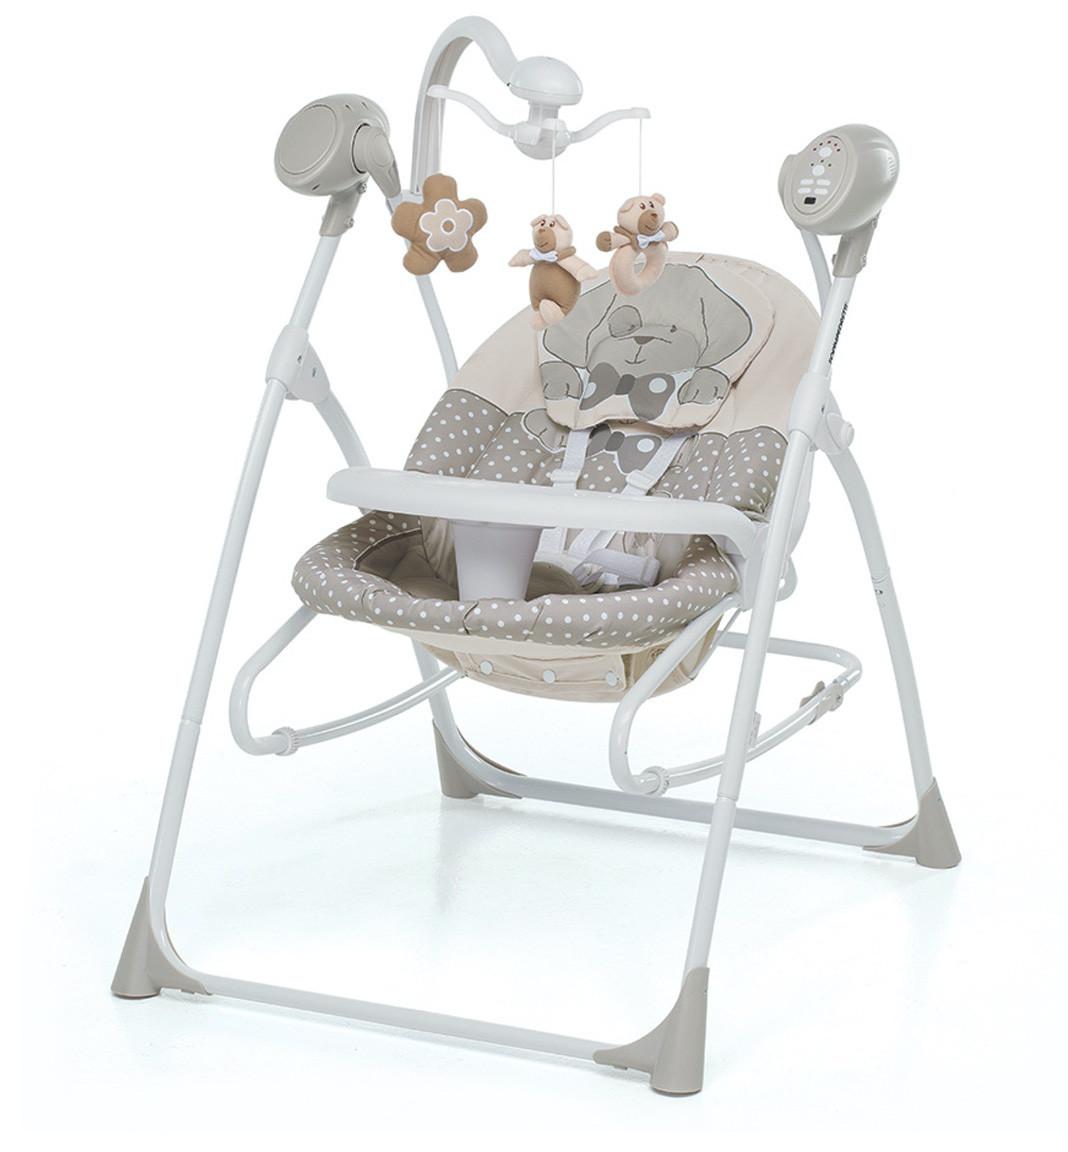 Foppapedretti Babyschaukel Carillon